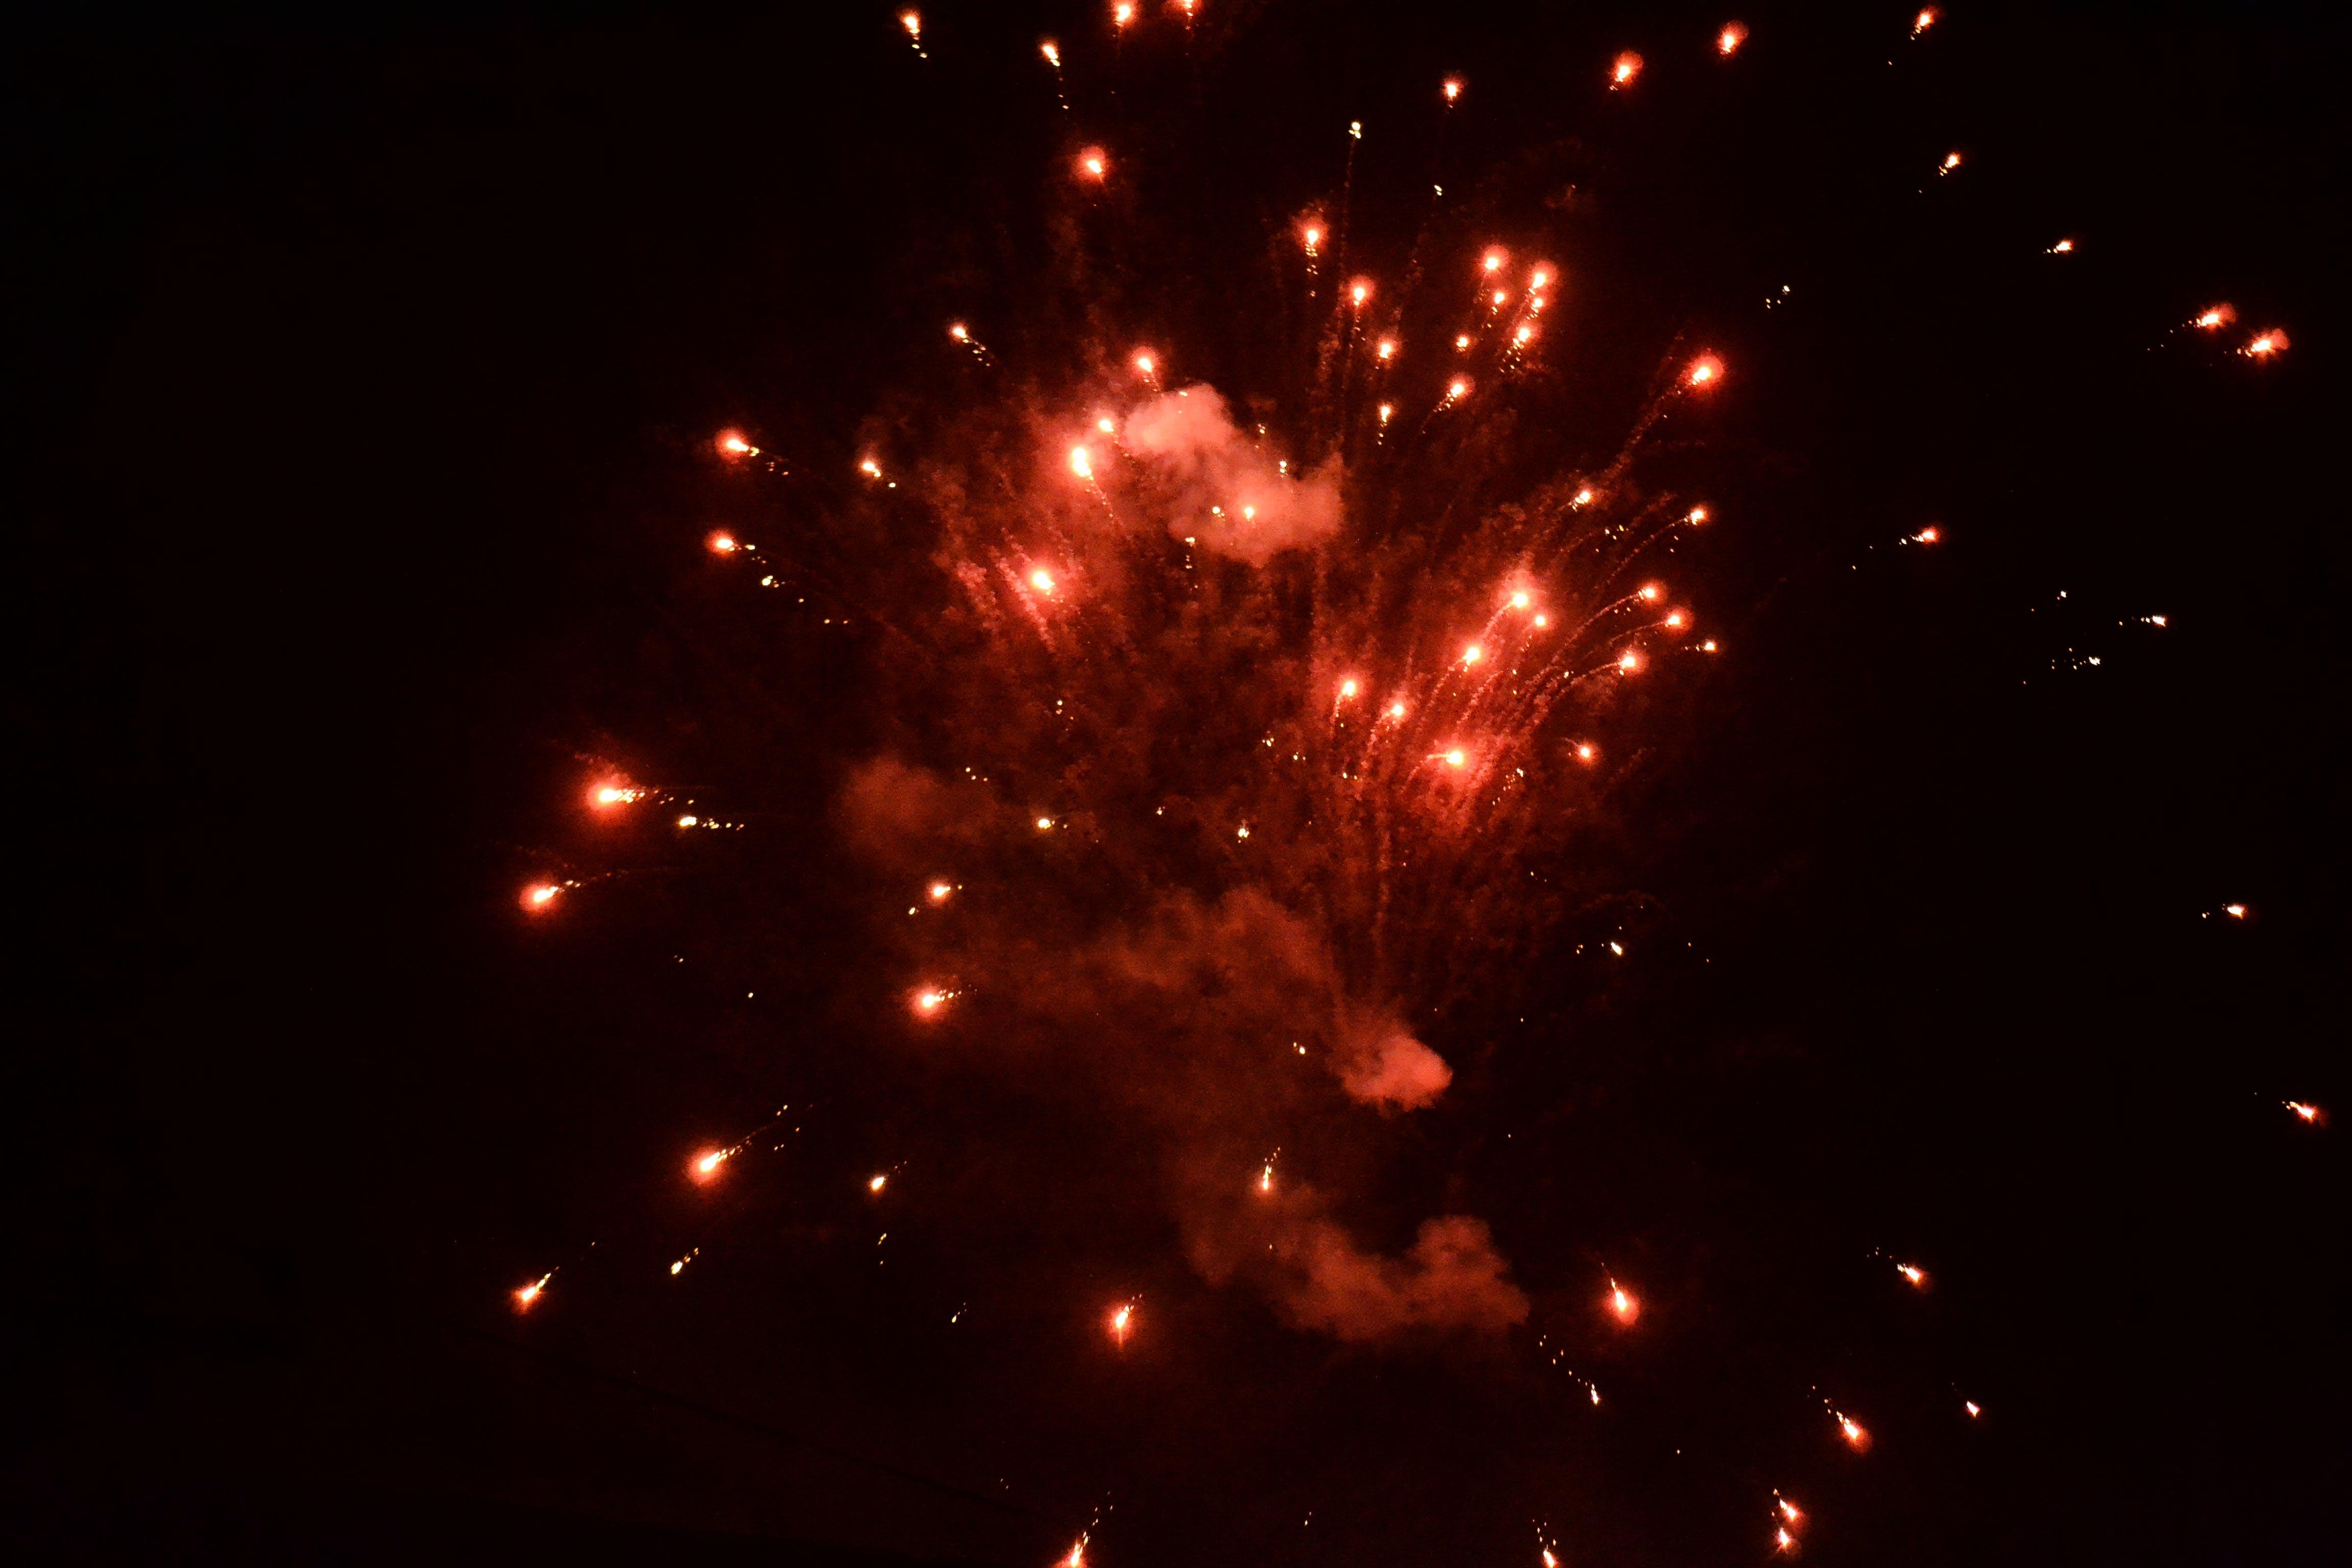 Free stock photo of abstract photo, Dark Sky, firecracker, fireworks